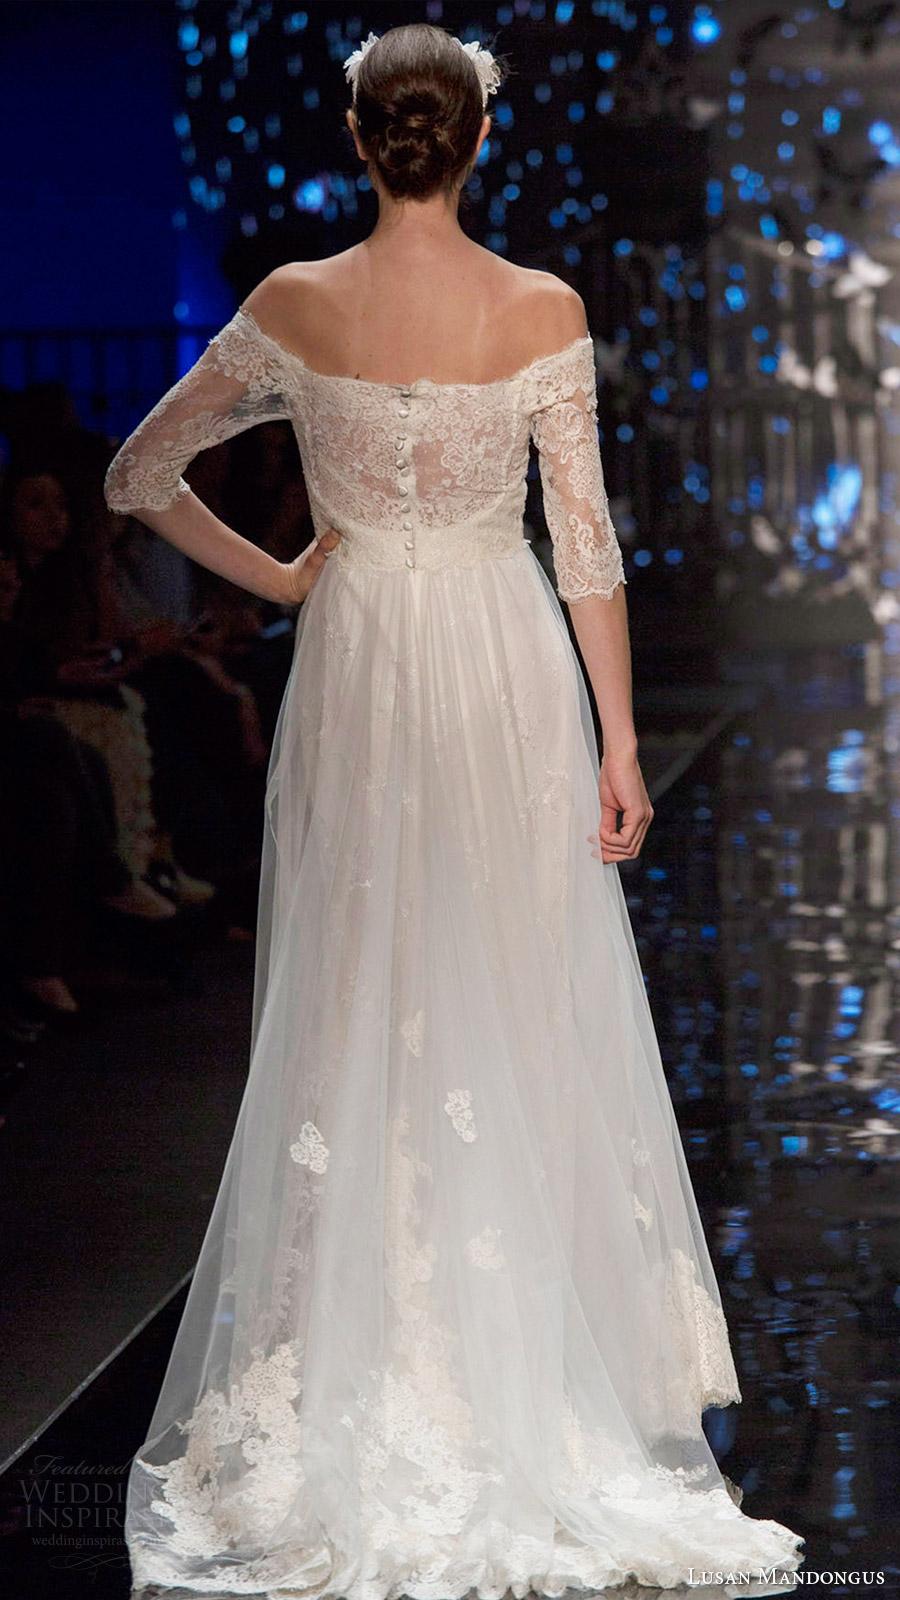 lusan mandongus bridal 2017 off shoulder illusion long sleeves lace aline wedding dress (zeta) bv train